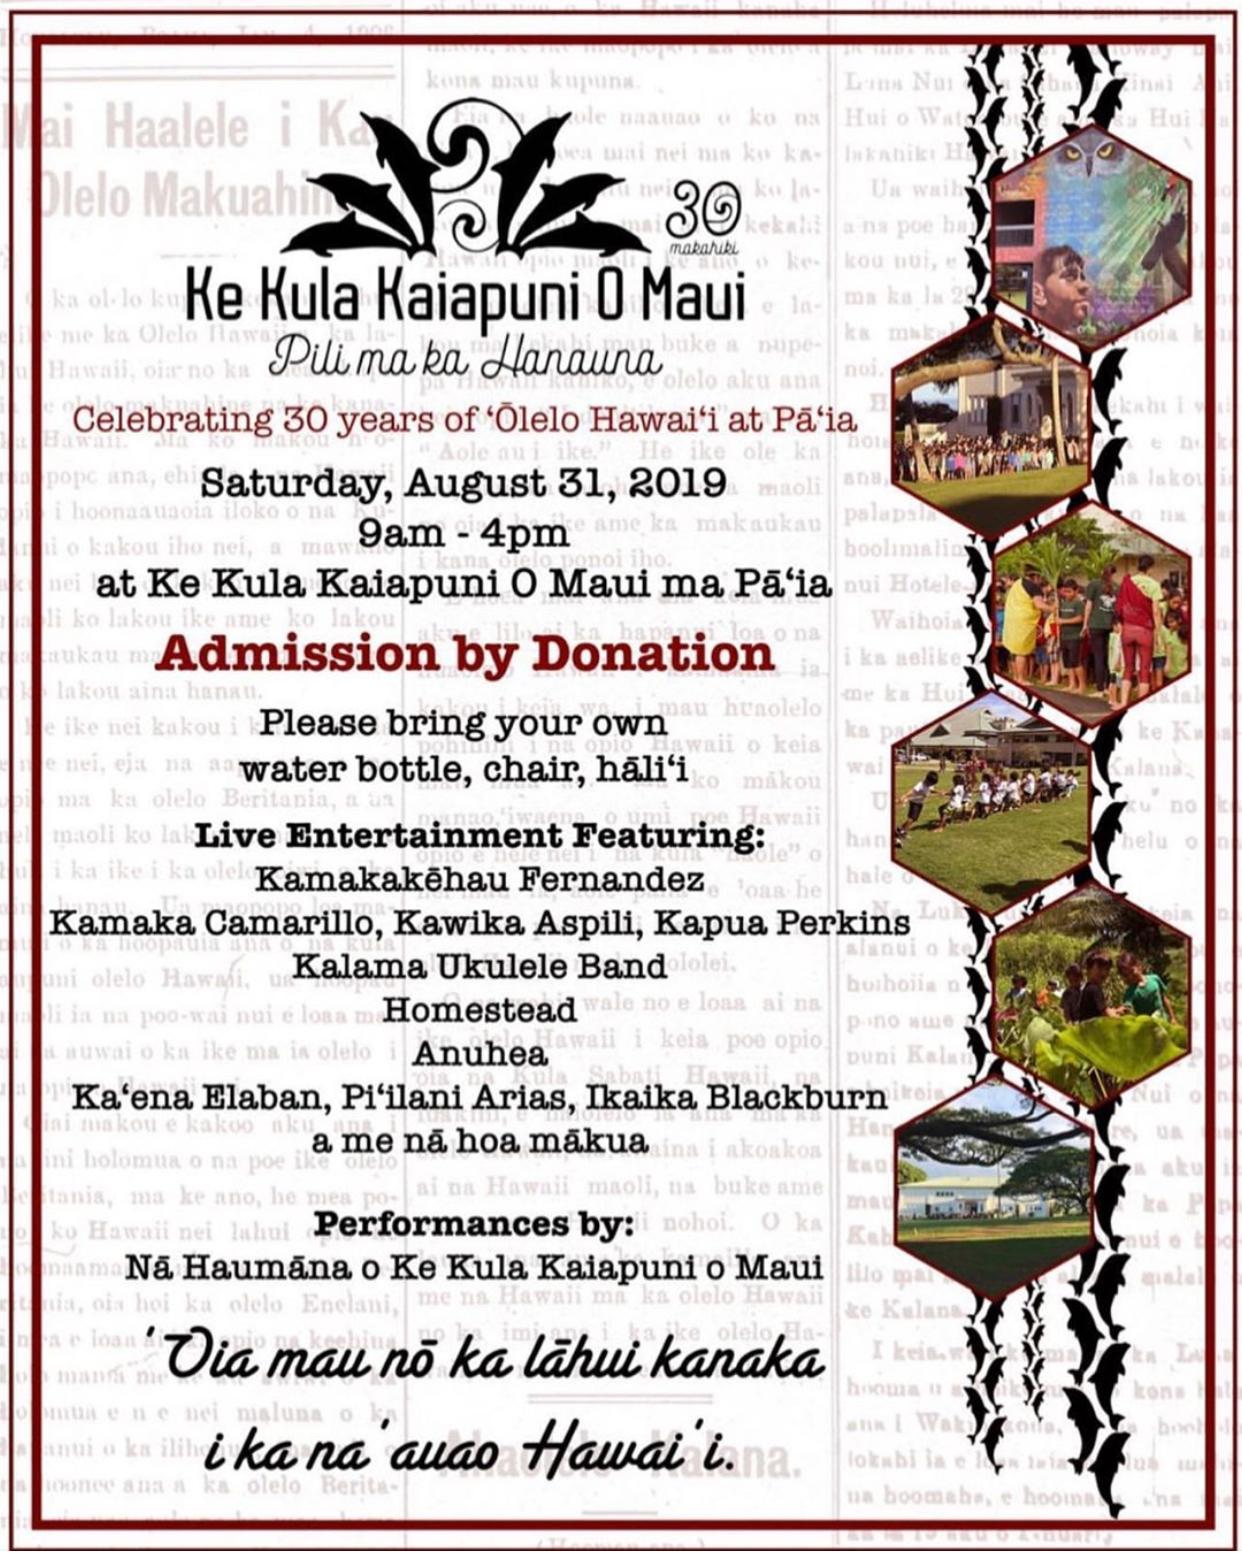 Ke Kula Kaiapuni O Maui 8-31.JPG